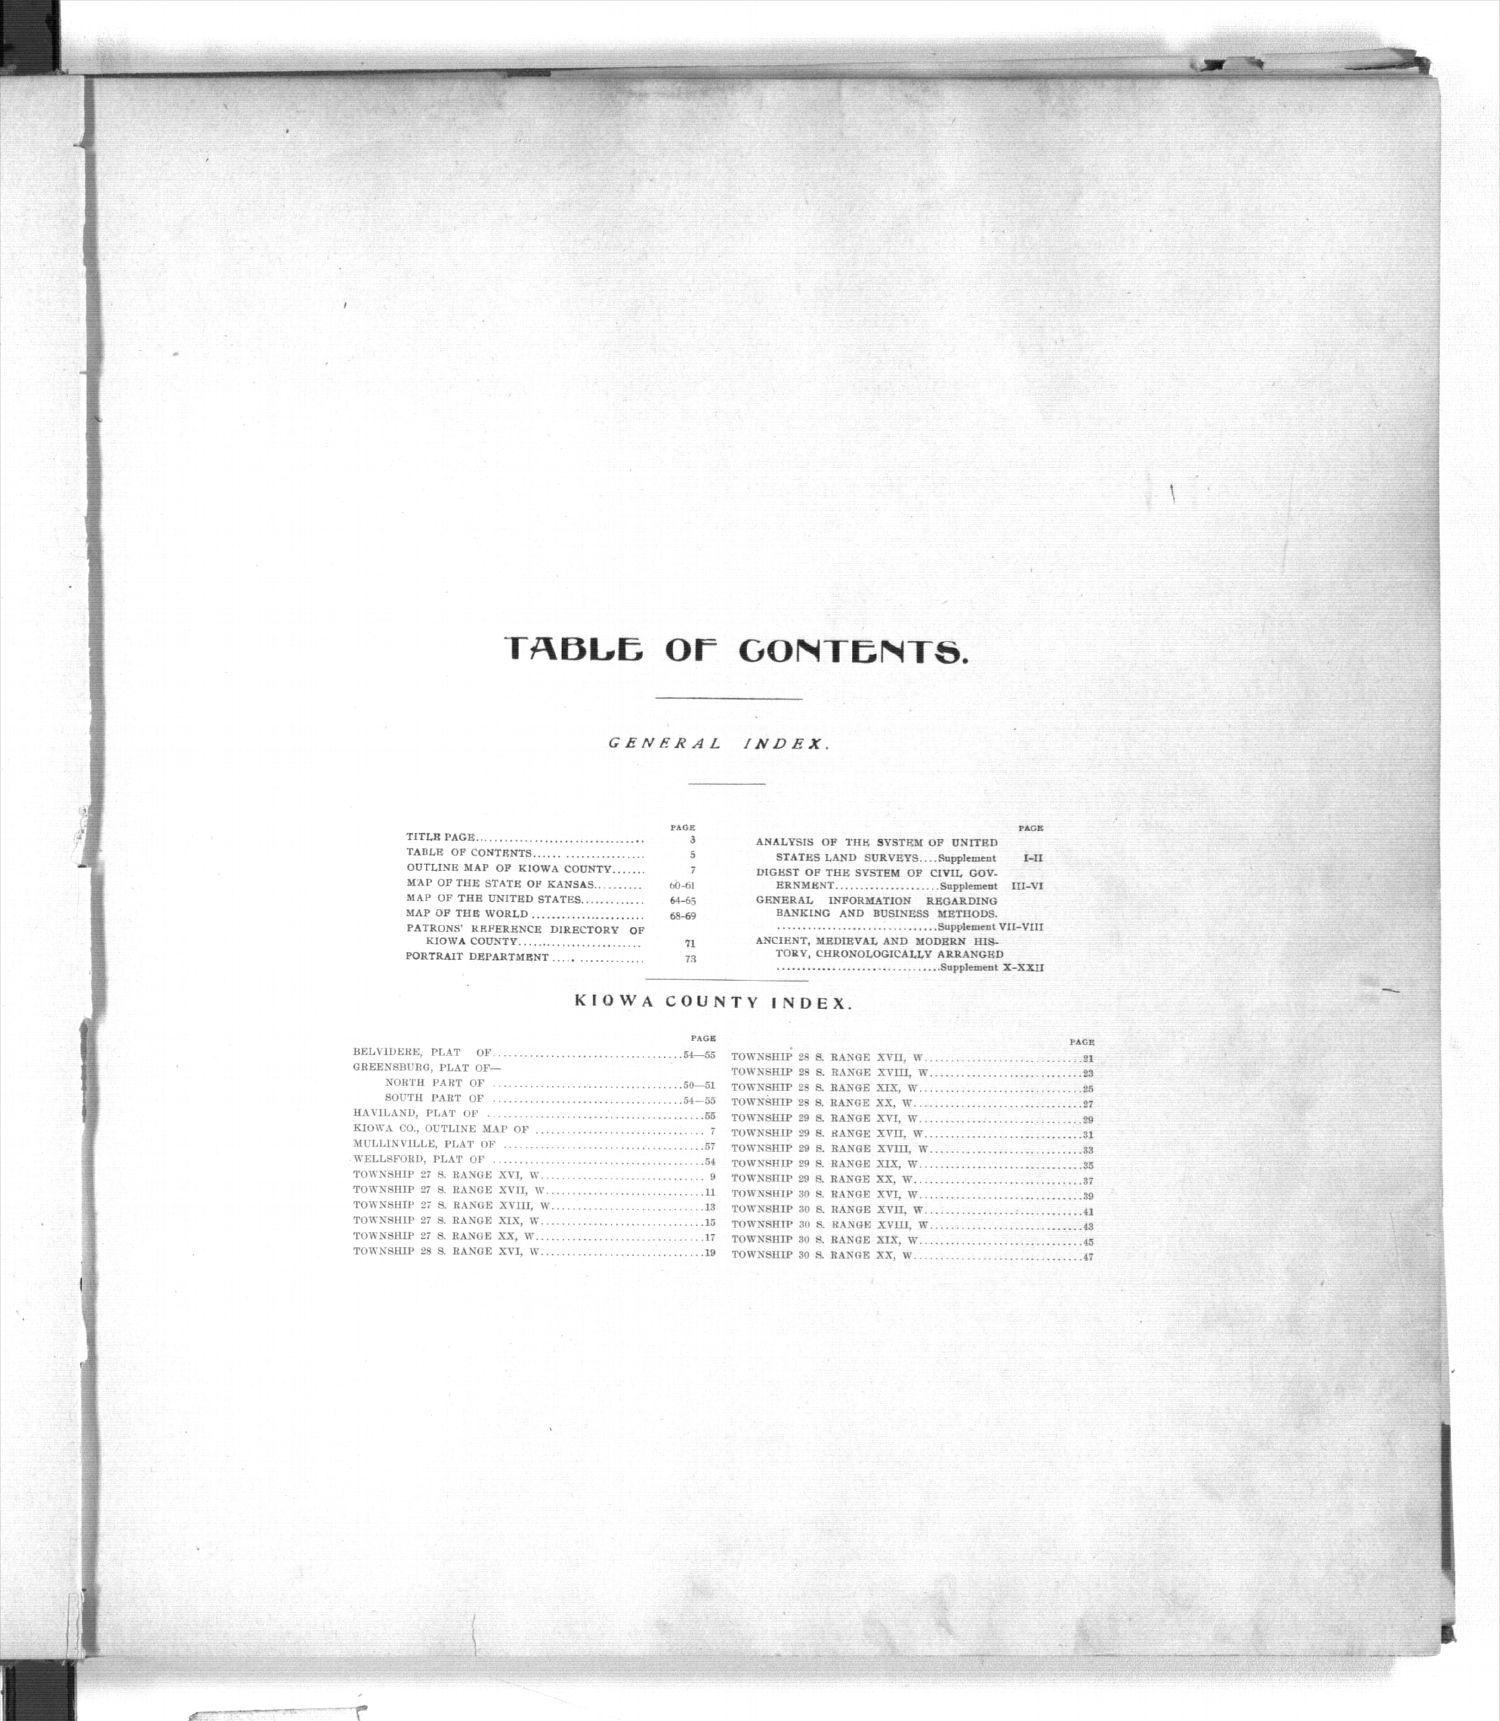 Standard atlas of Kiowa County, Kansas - Table of Contents